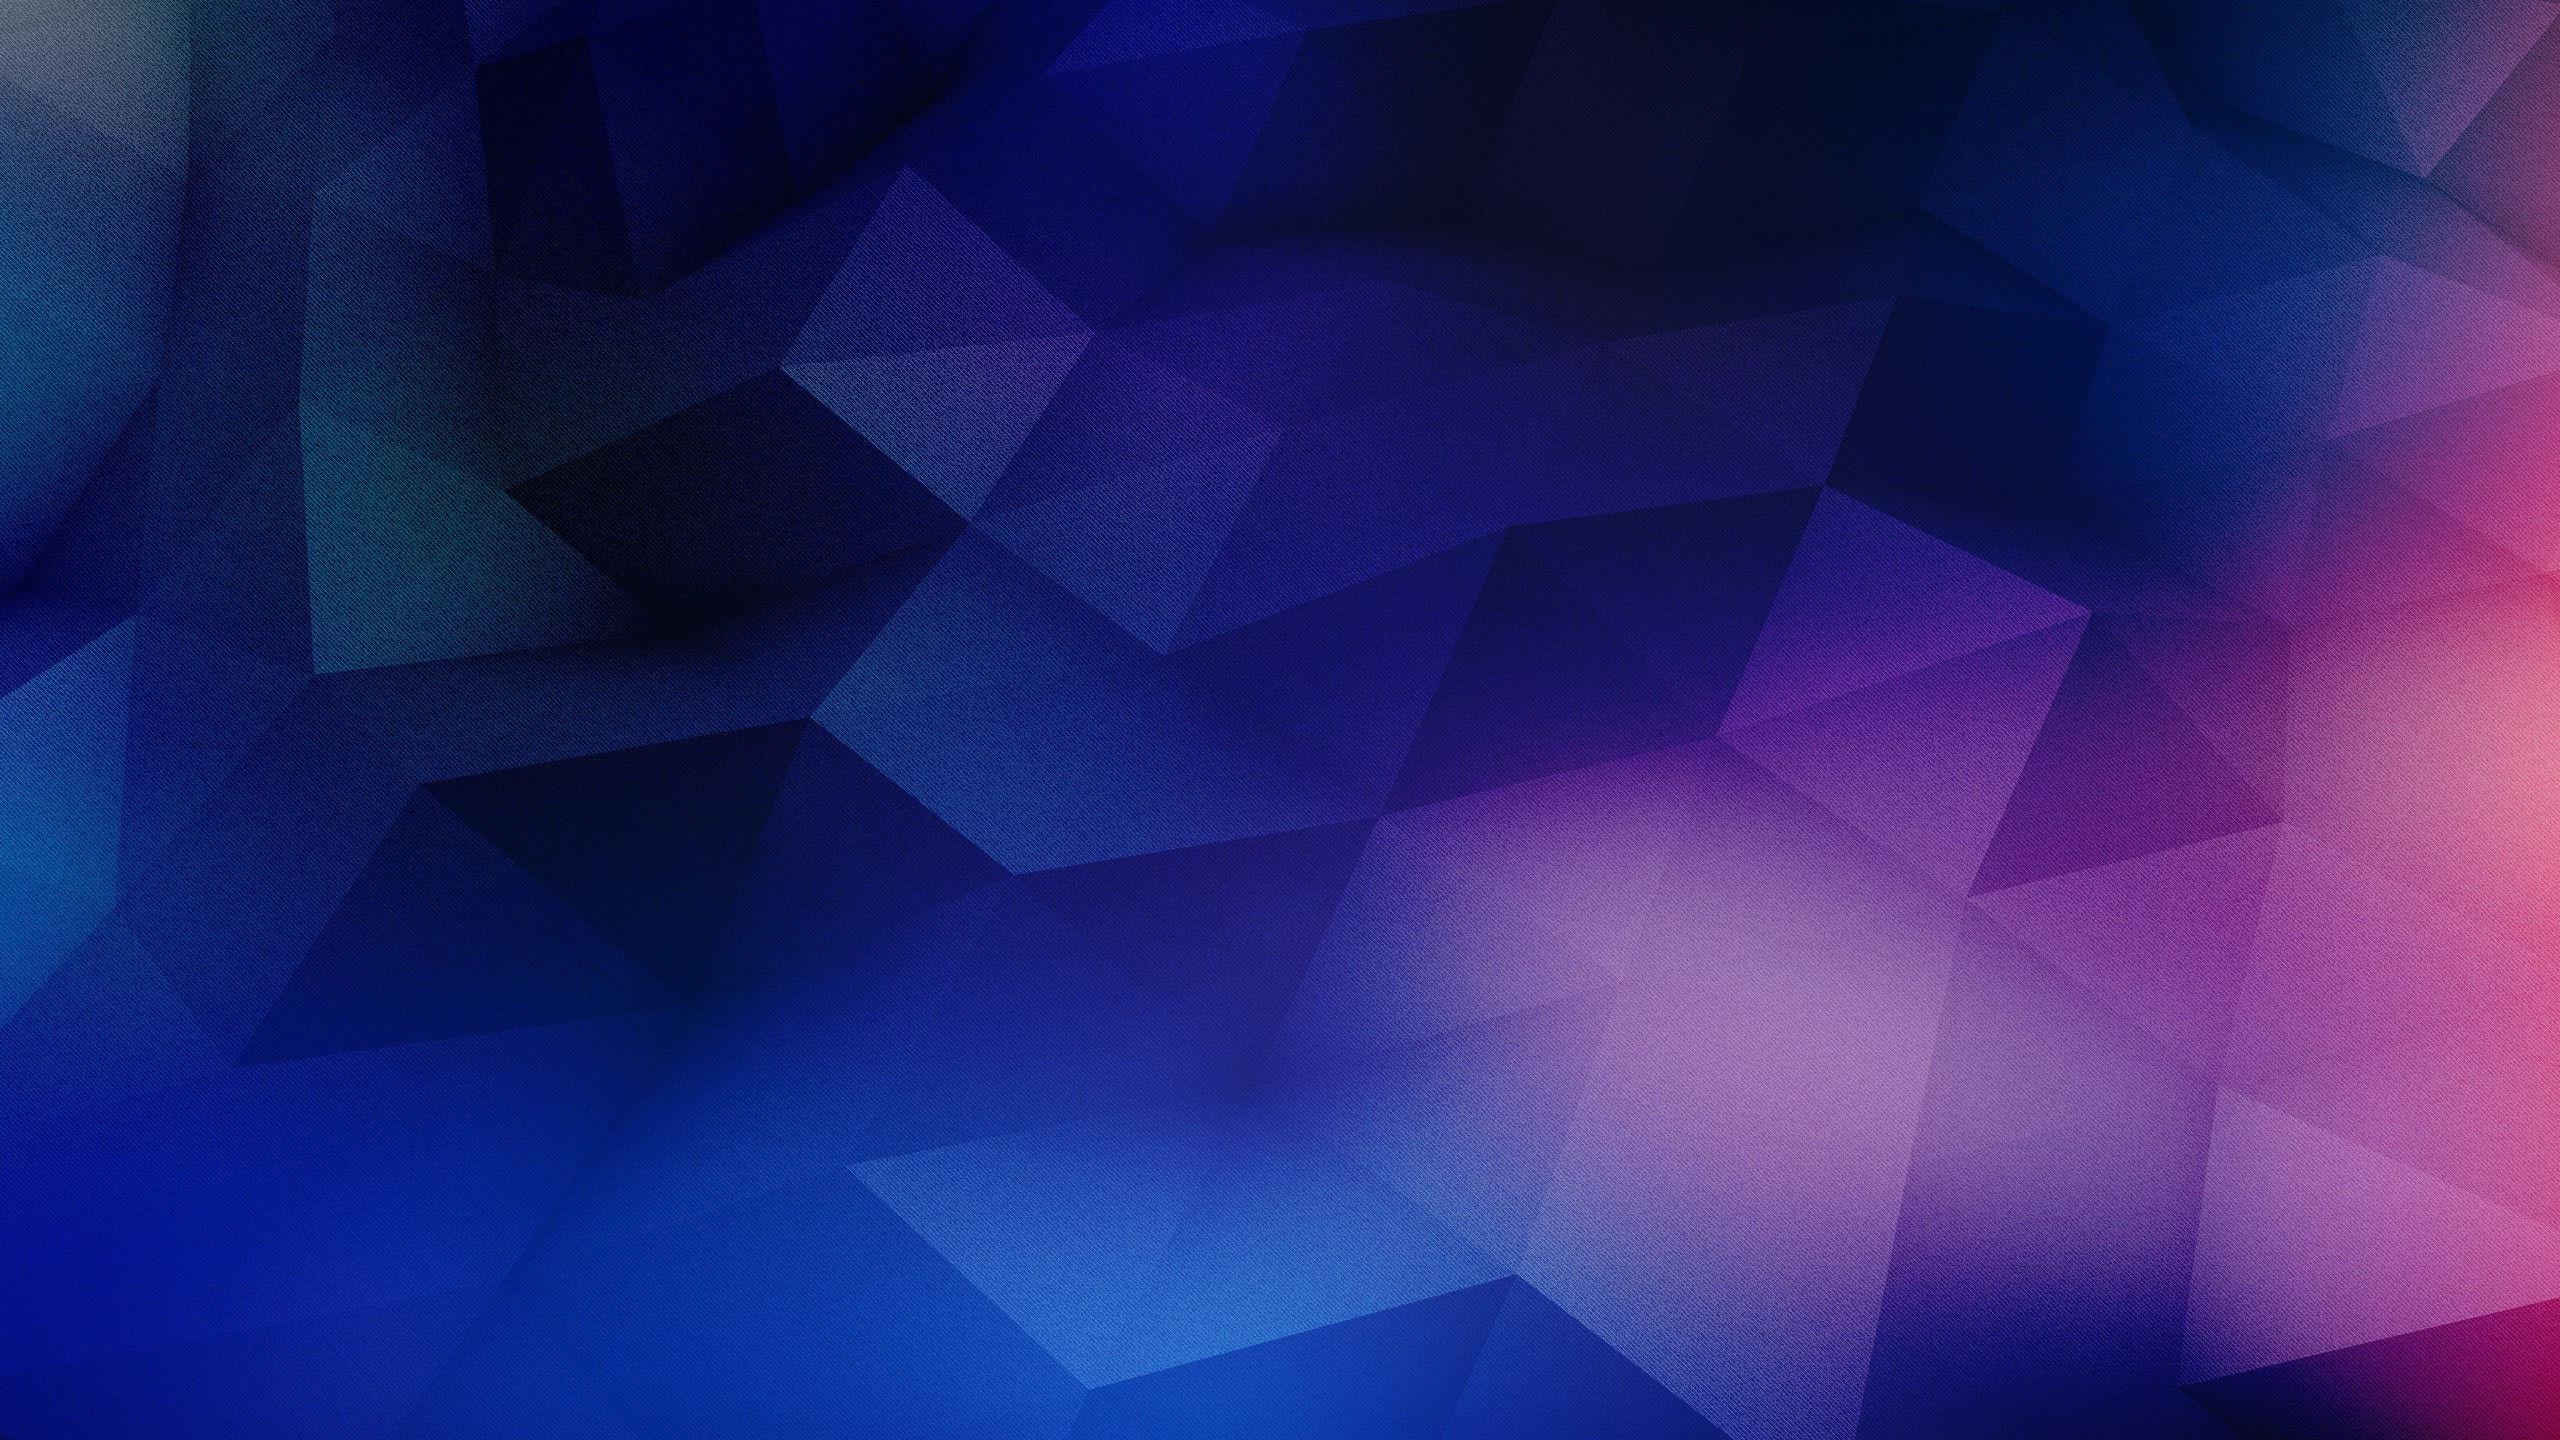 Apple 3d Wallpaper Iphone 7 Polygon Wallpaper 23 2560x1440